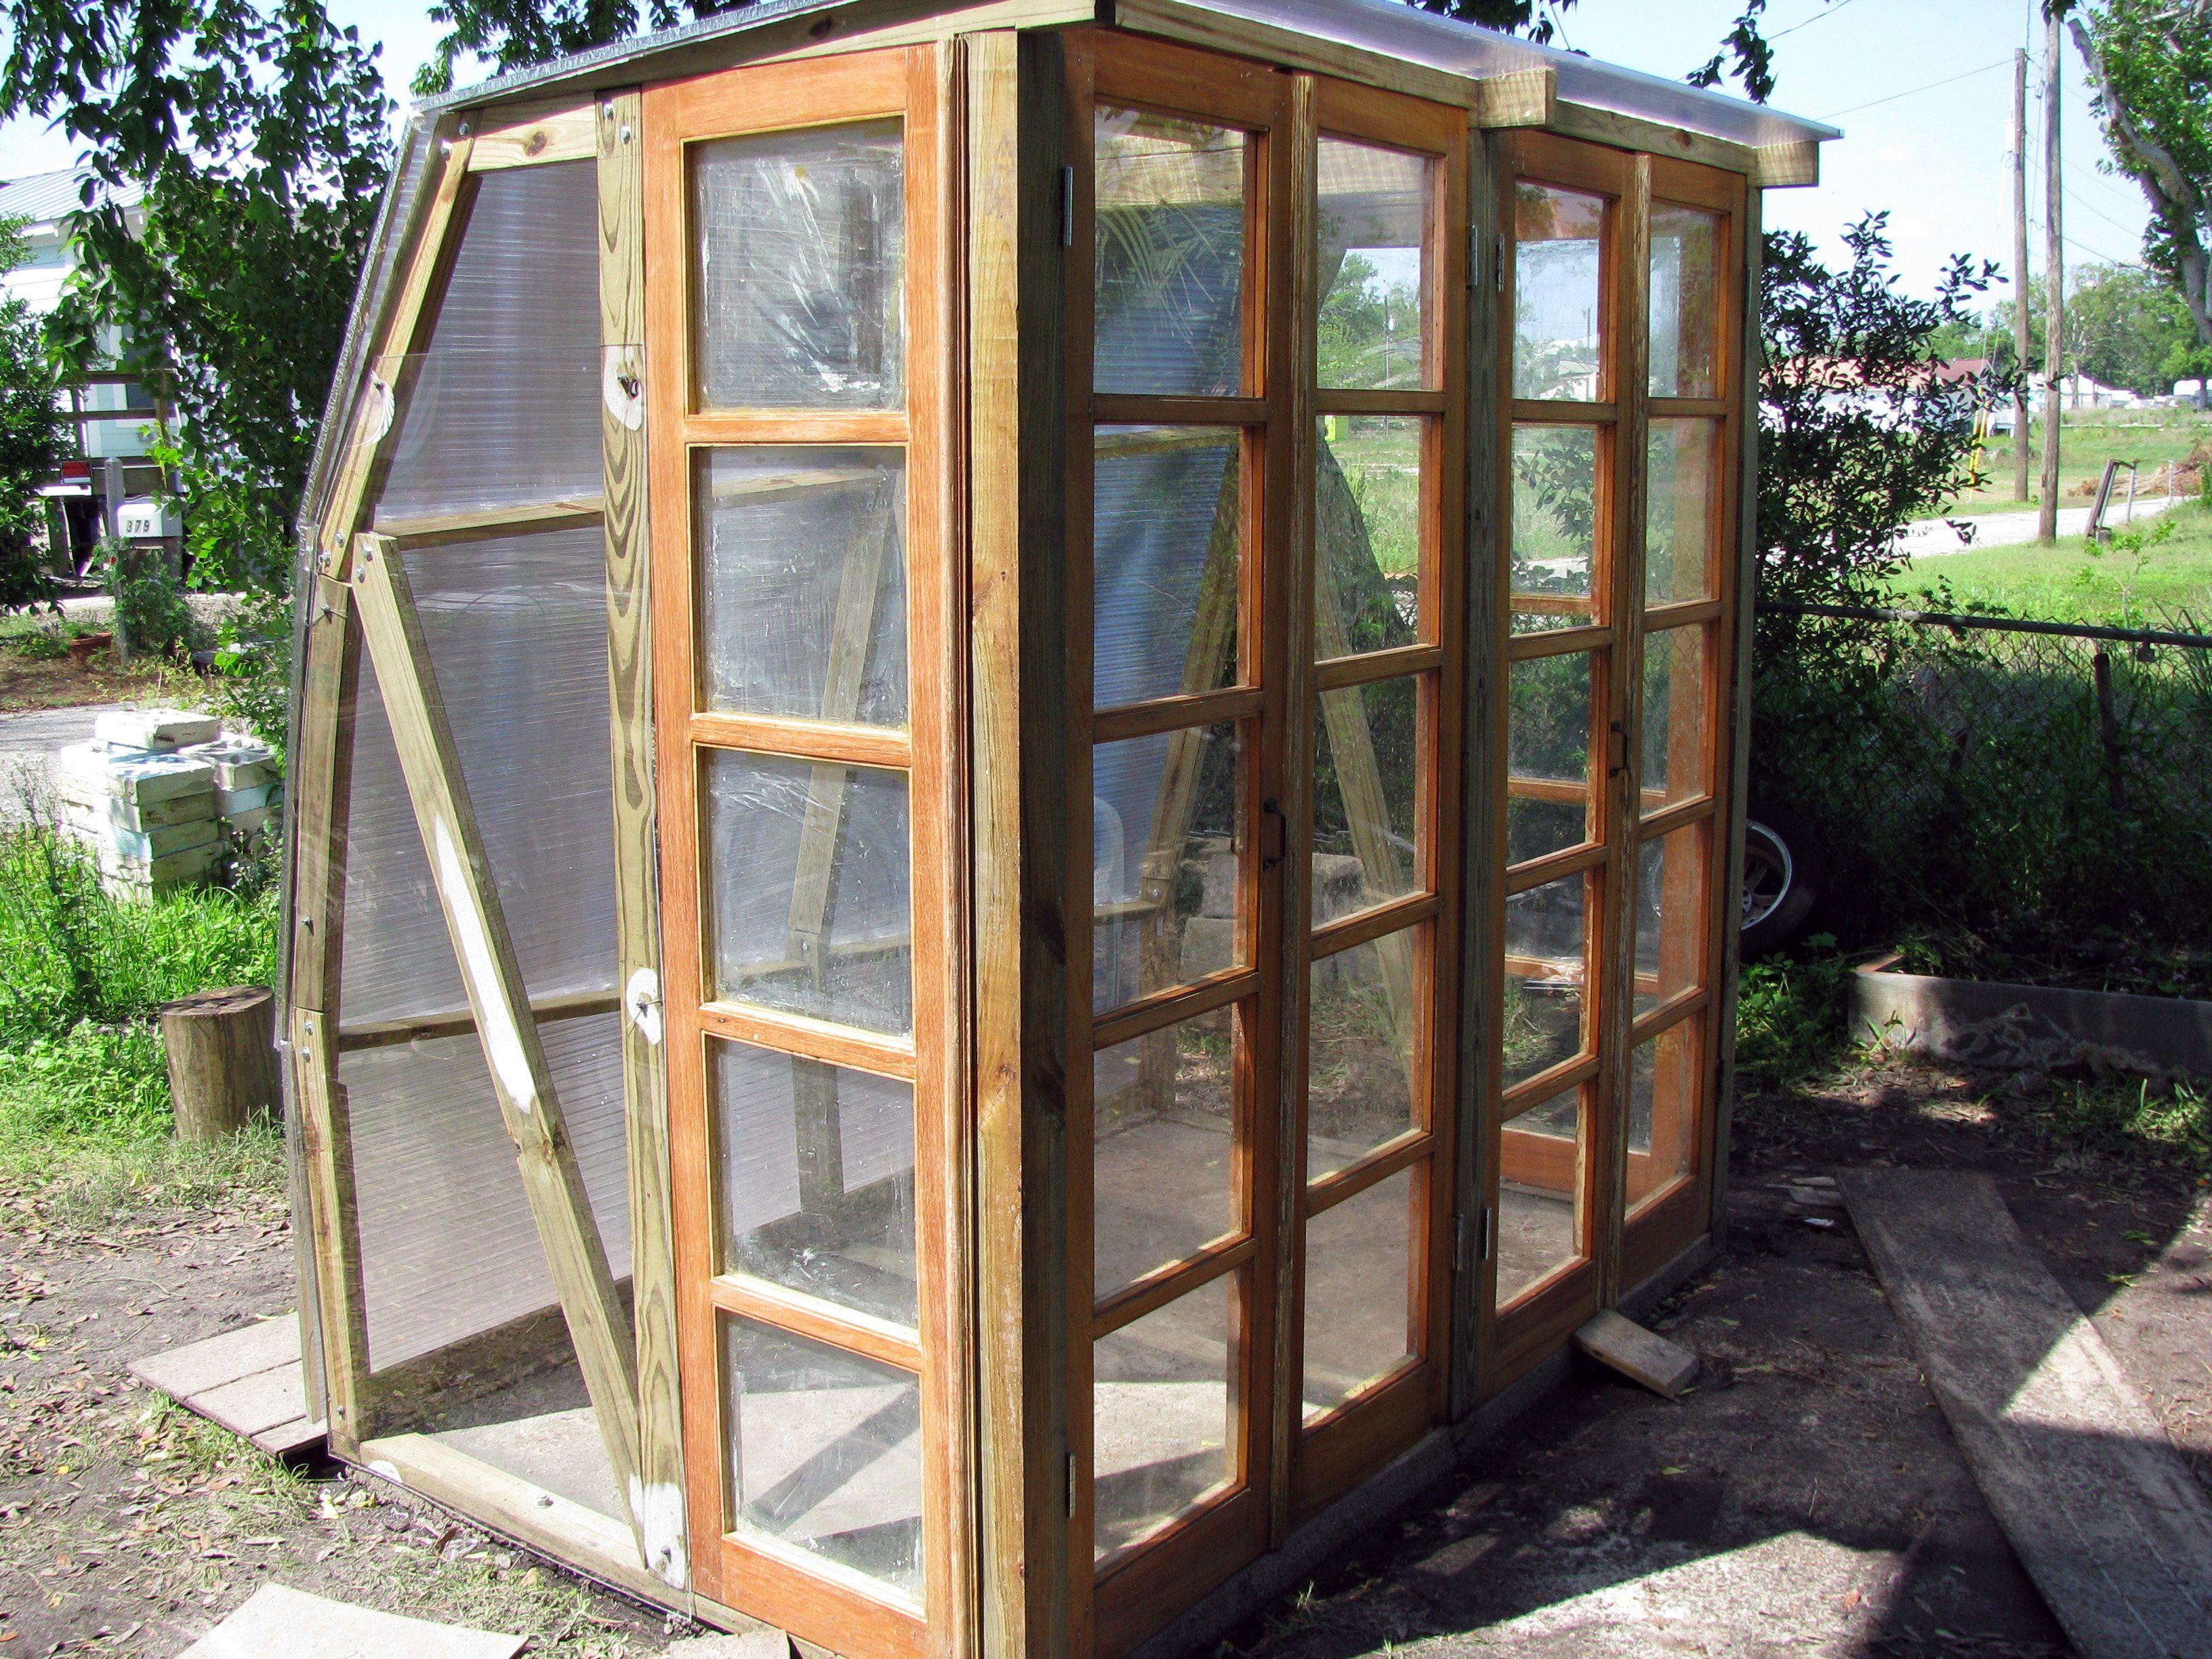 Greenhouse designbuild green house design green houses and small greenhouse designbuild solutioingenieria Images